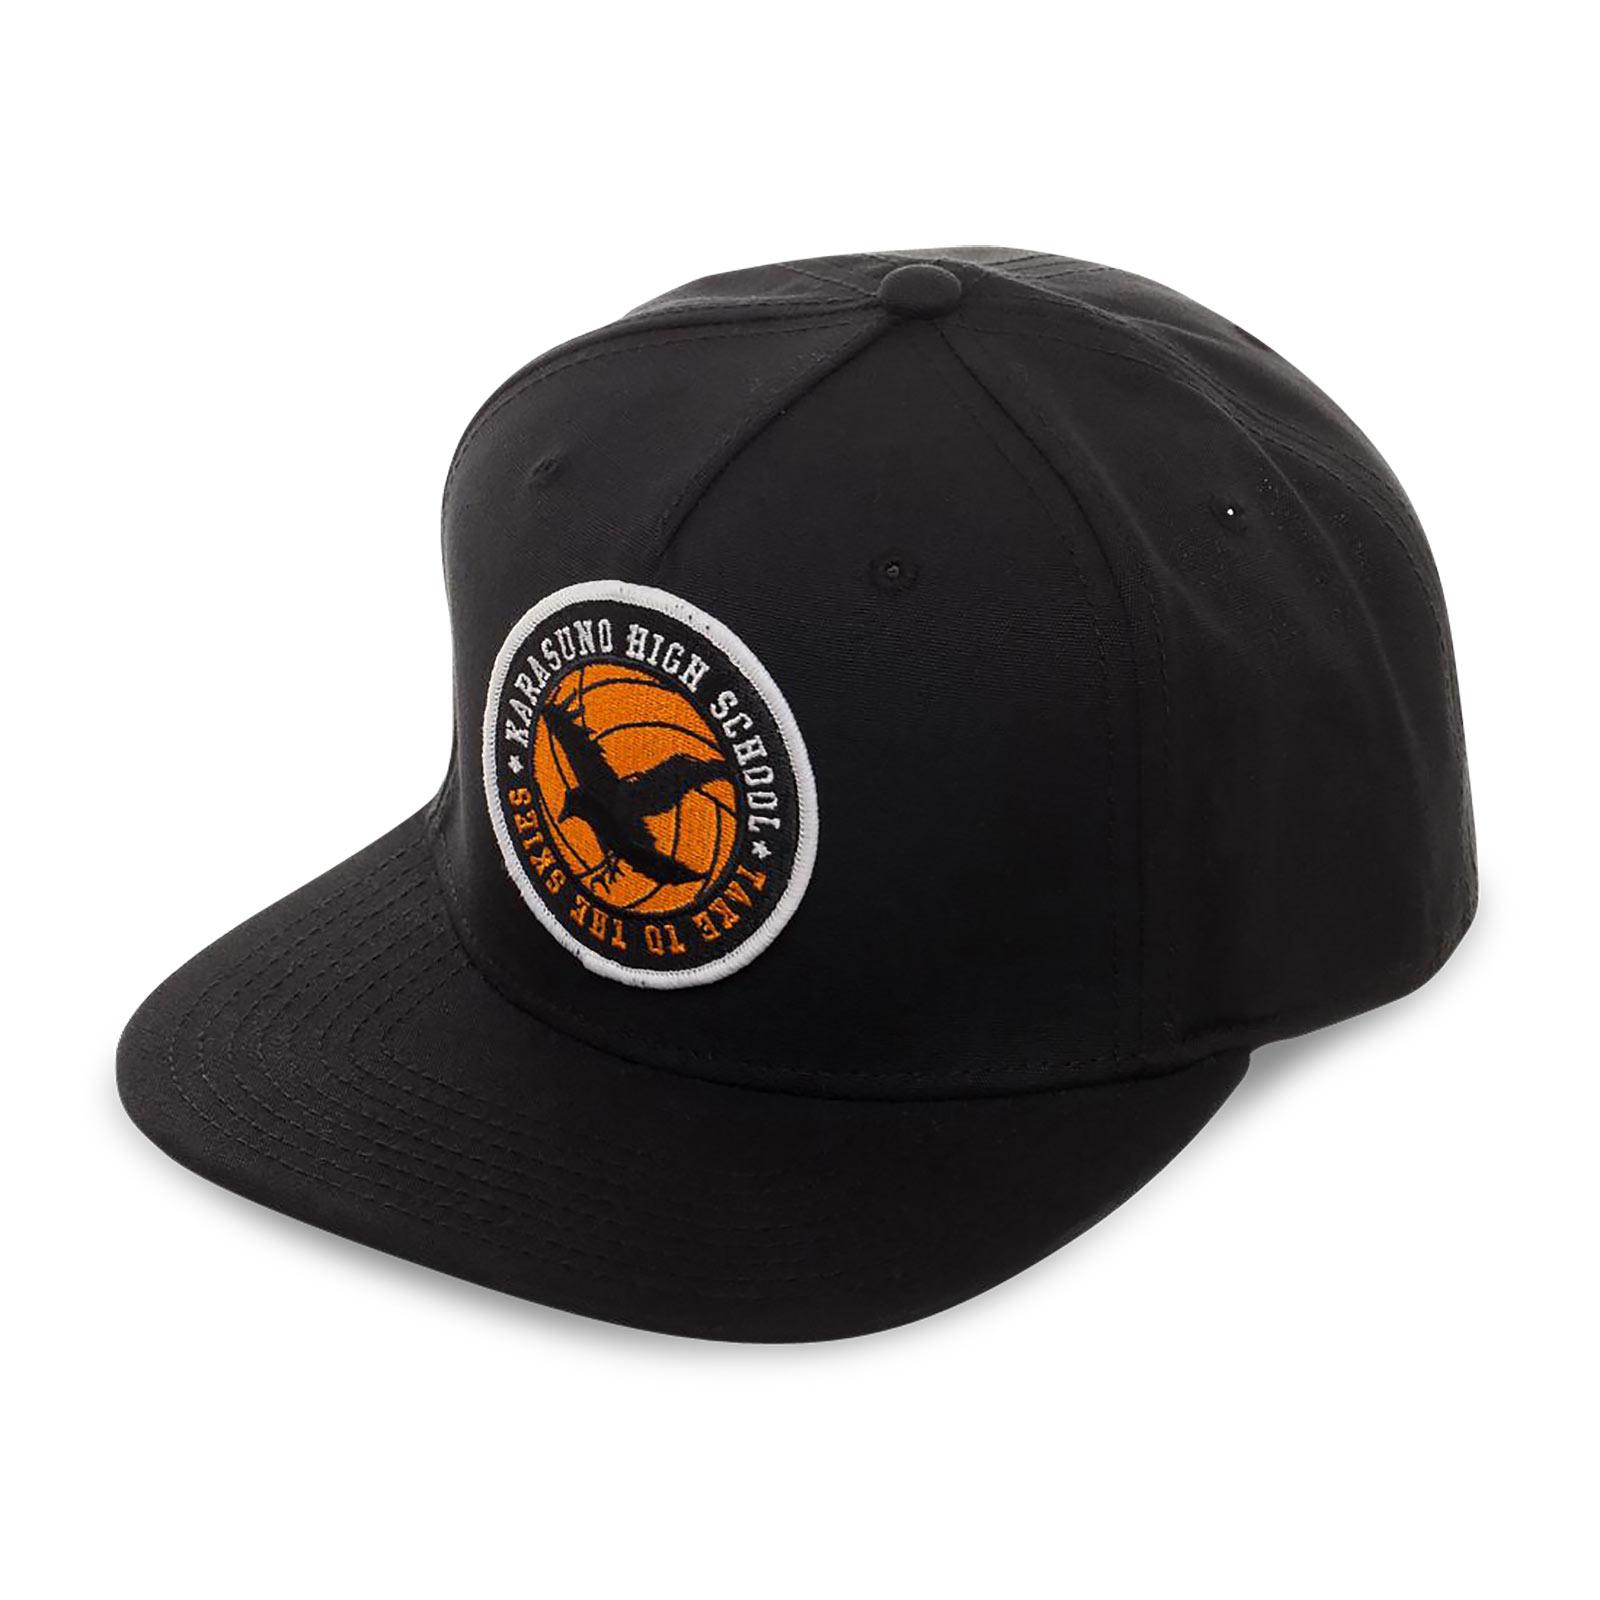 Haikyu!! - Crows High School Logo Snapback Cap schwarz